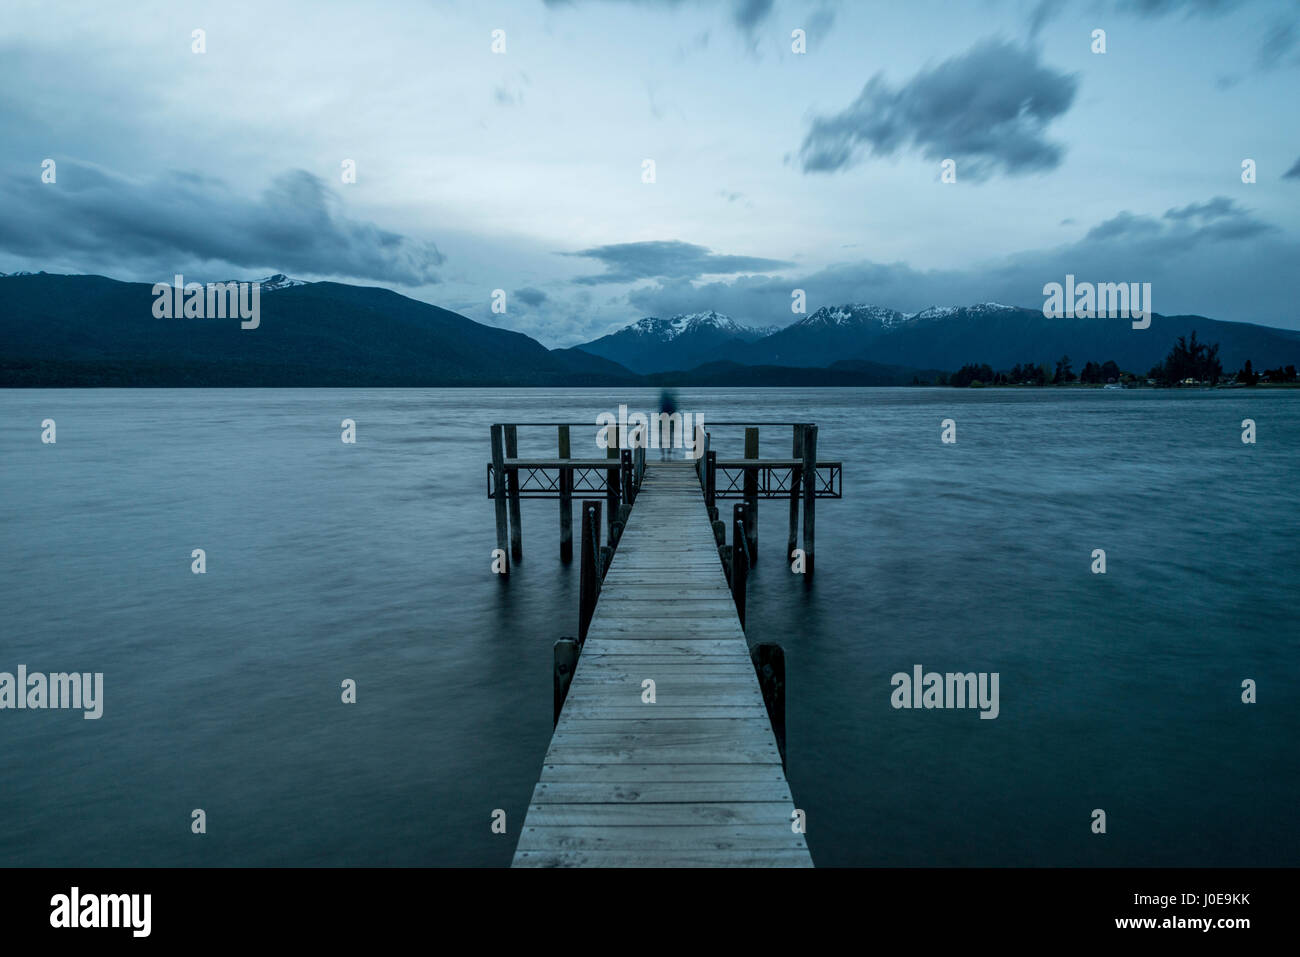 Bewölkter Himmel über Berge, Silhouette stehend auf Dock, Lake Te Anau, Southland, Neuseeland Stockbild